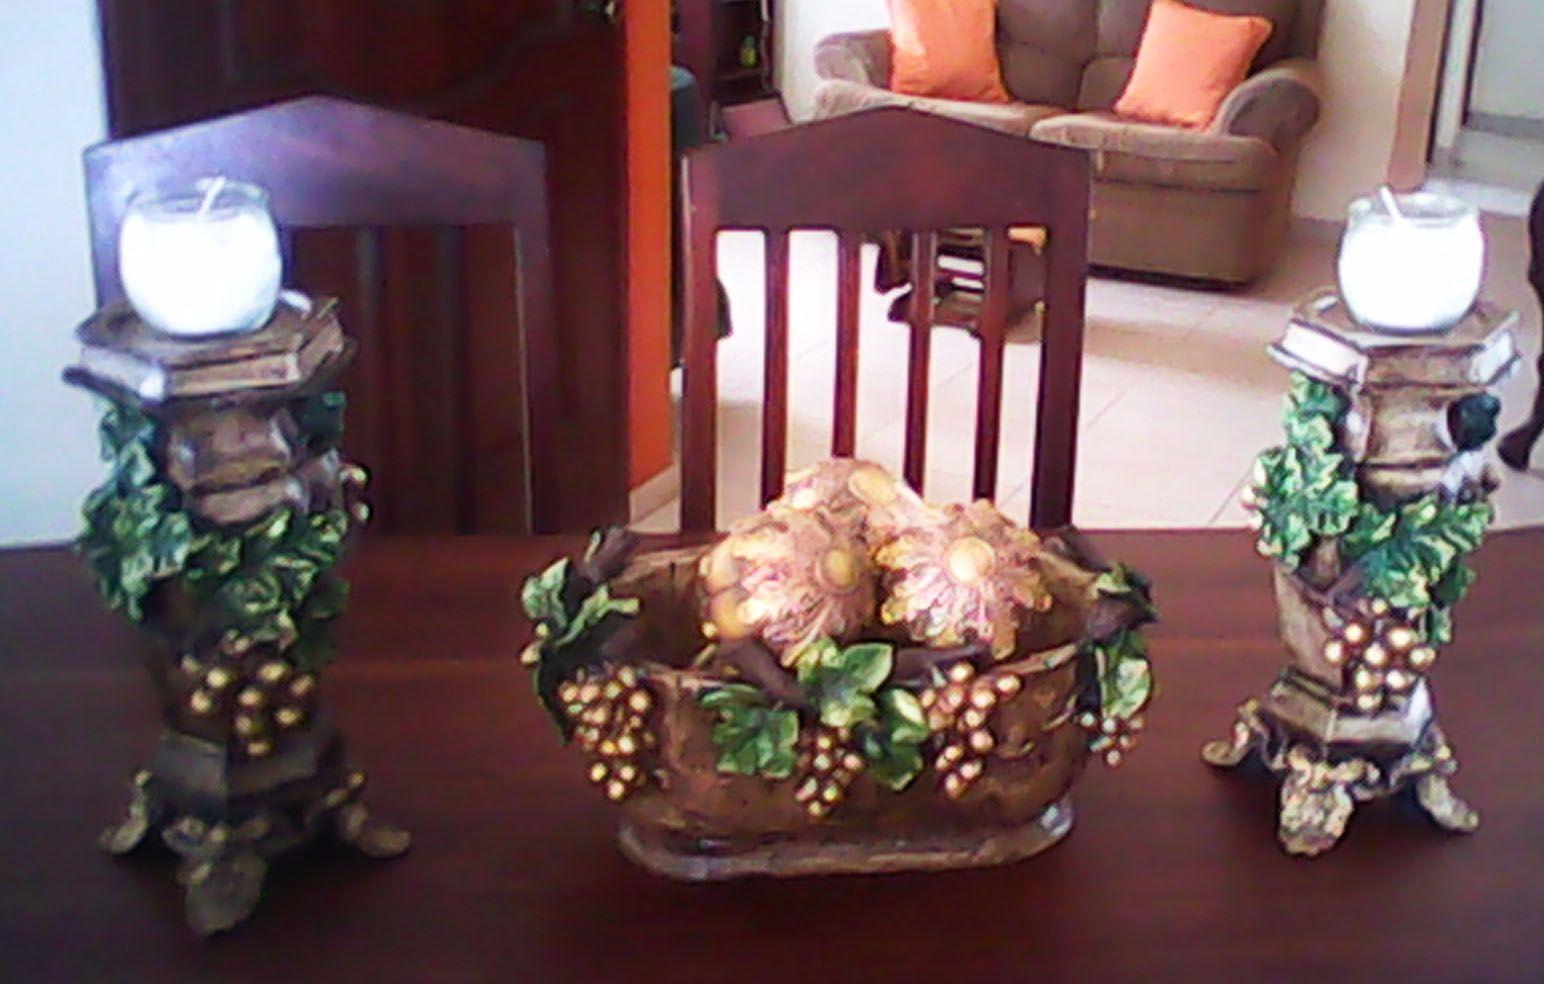 Juego de mesa centro uvas, esta hecho de resina e incluye 10 piezas ...